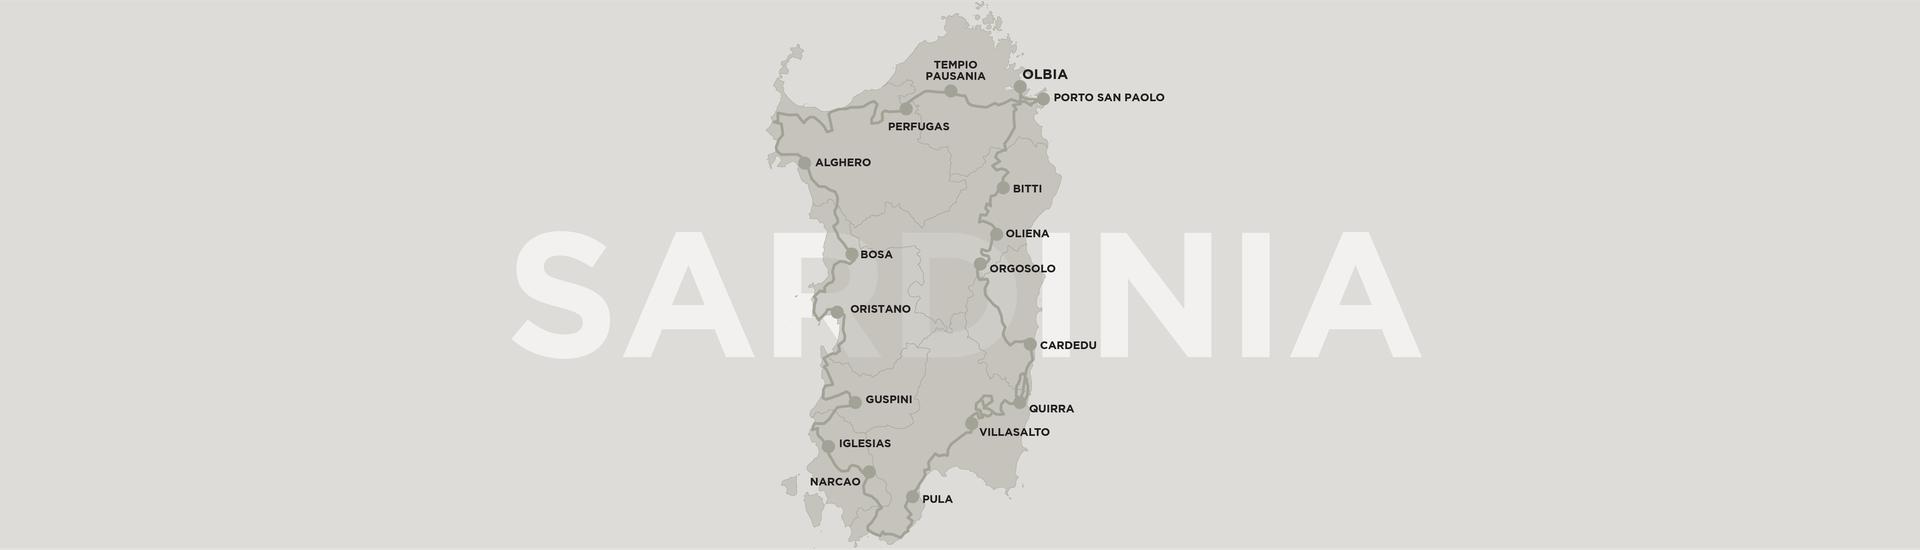 Dainese Sardinia route map